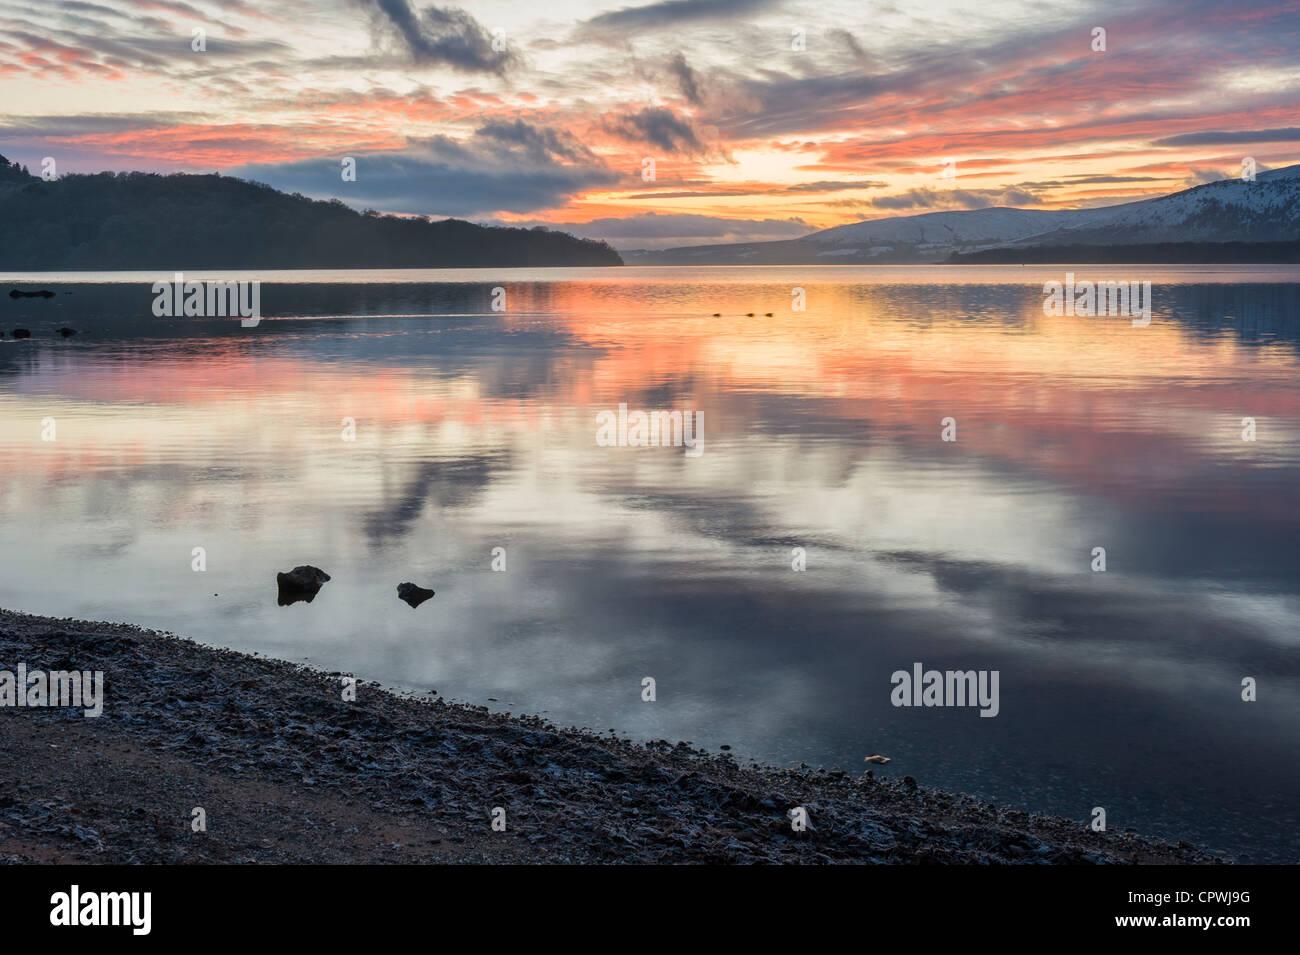 Stunning sunset, Loch Lomond, Scotland, UK - Stock Image